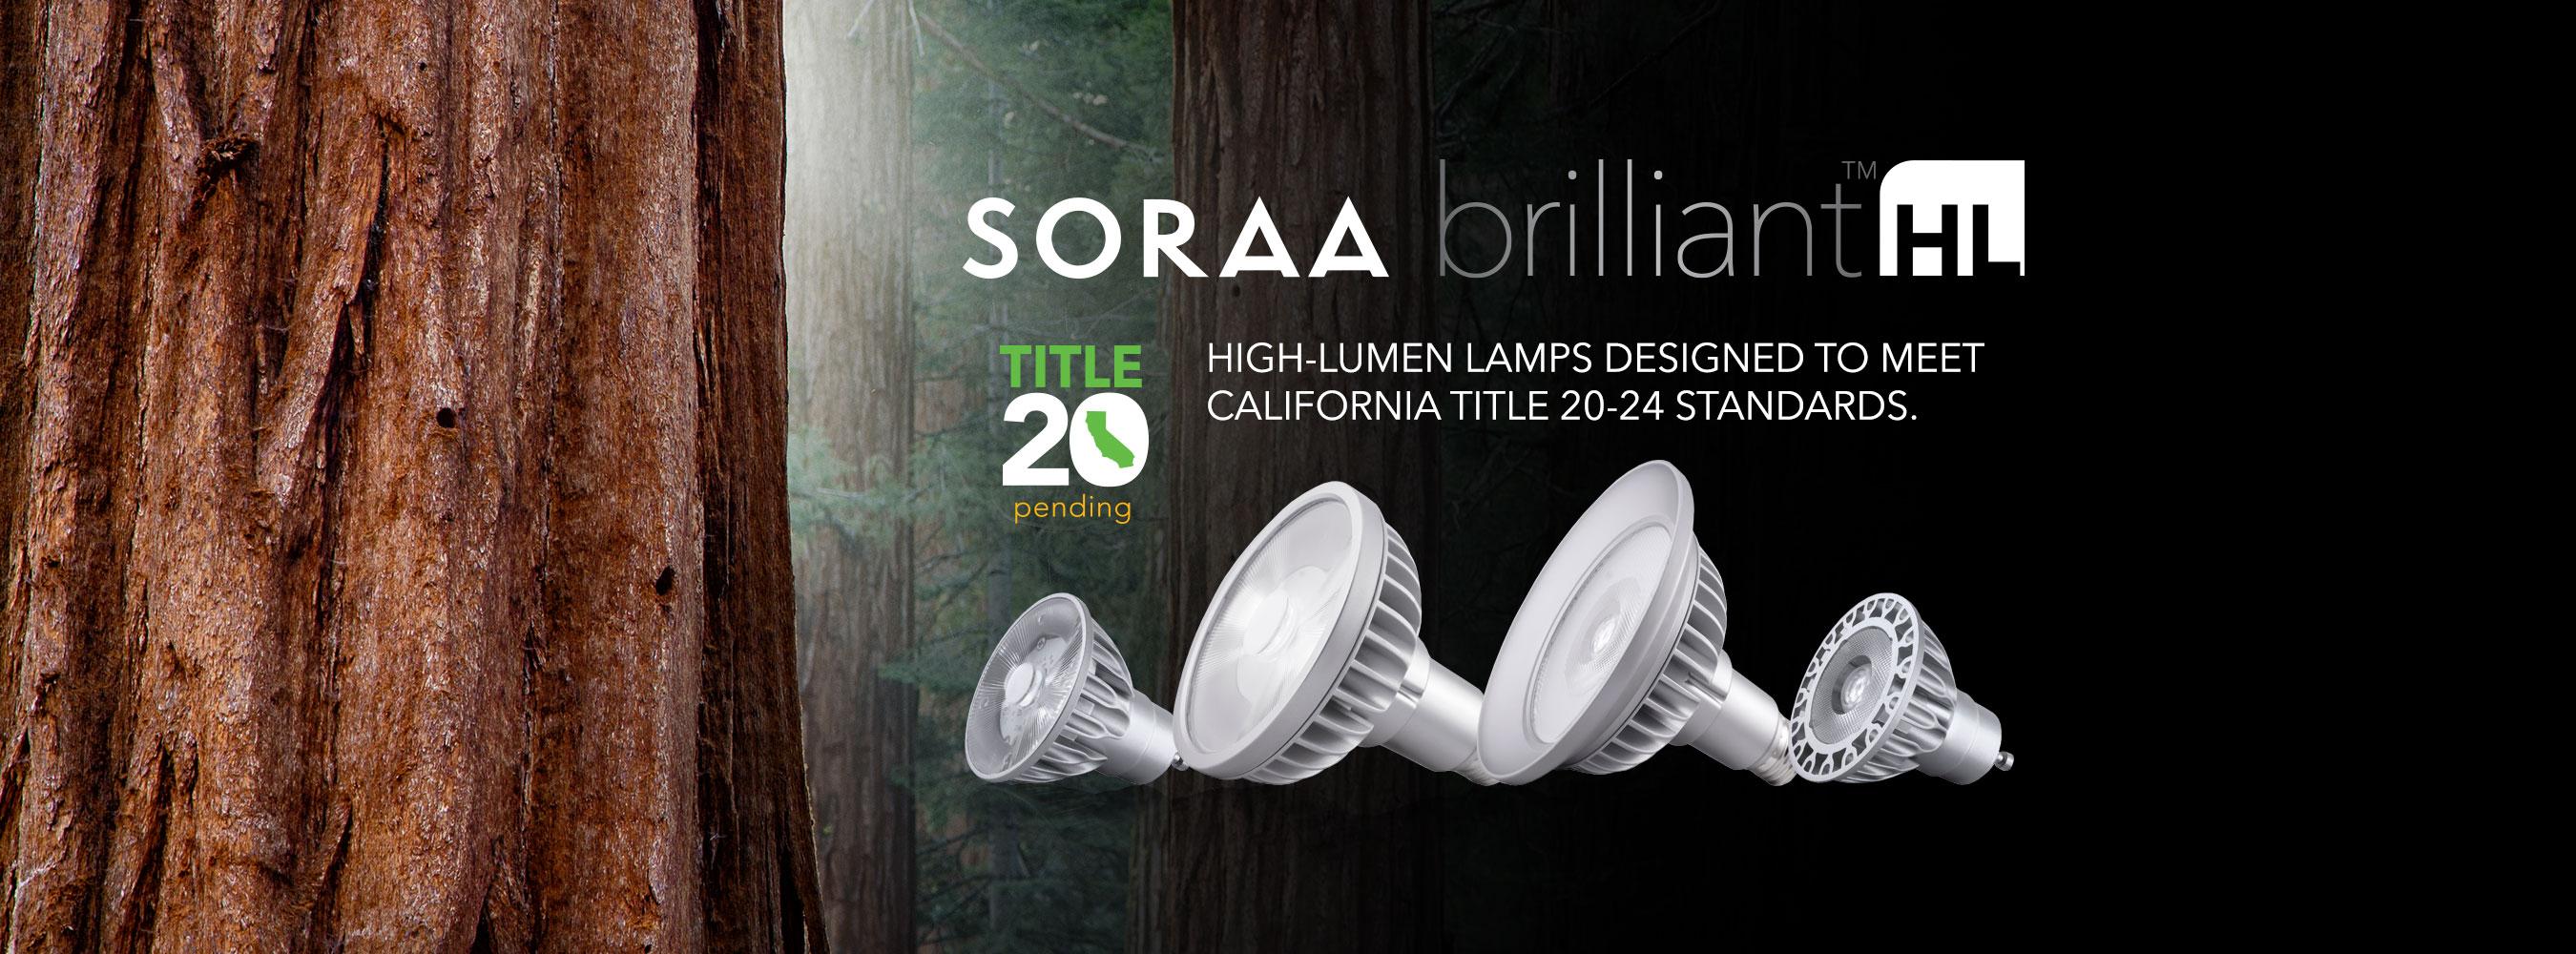 Soraa: Simply Perfect Light